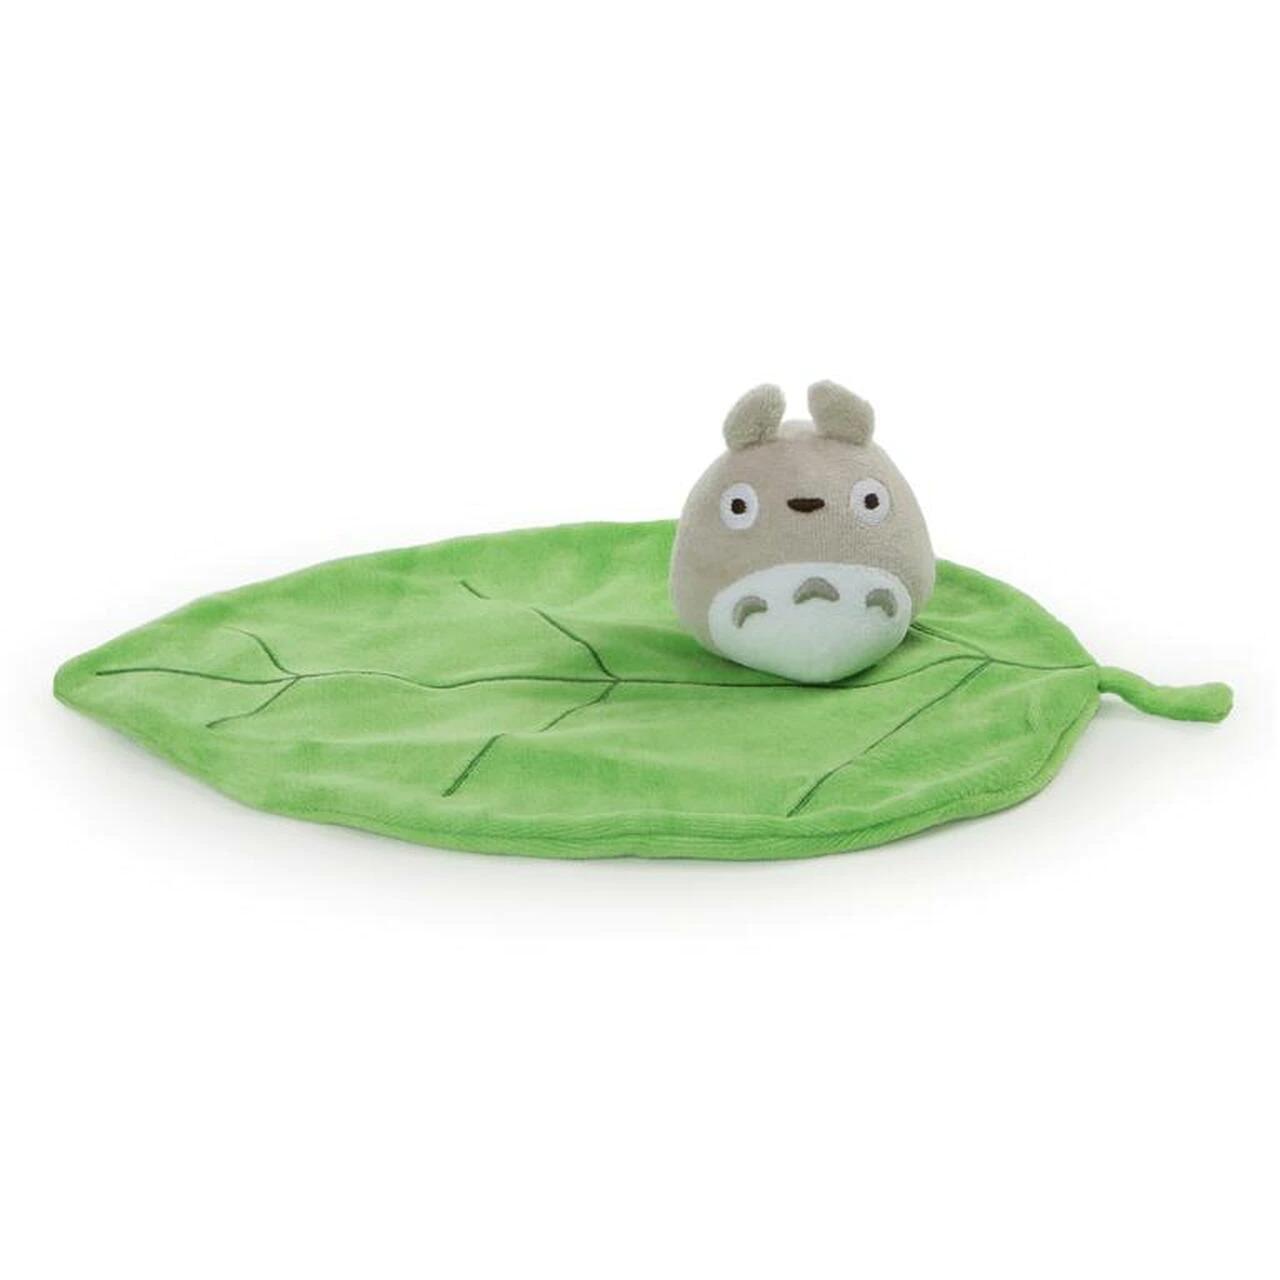 "Sun Arrow Baby My First Totoro - Big Totoro Leaf Lovey (Grey) ""My Neighbor Totoro"""